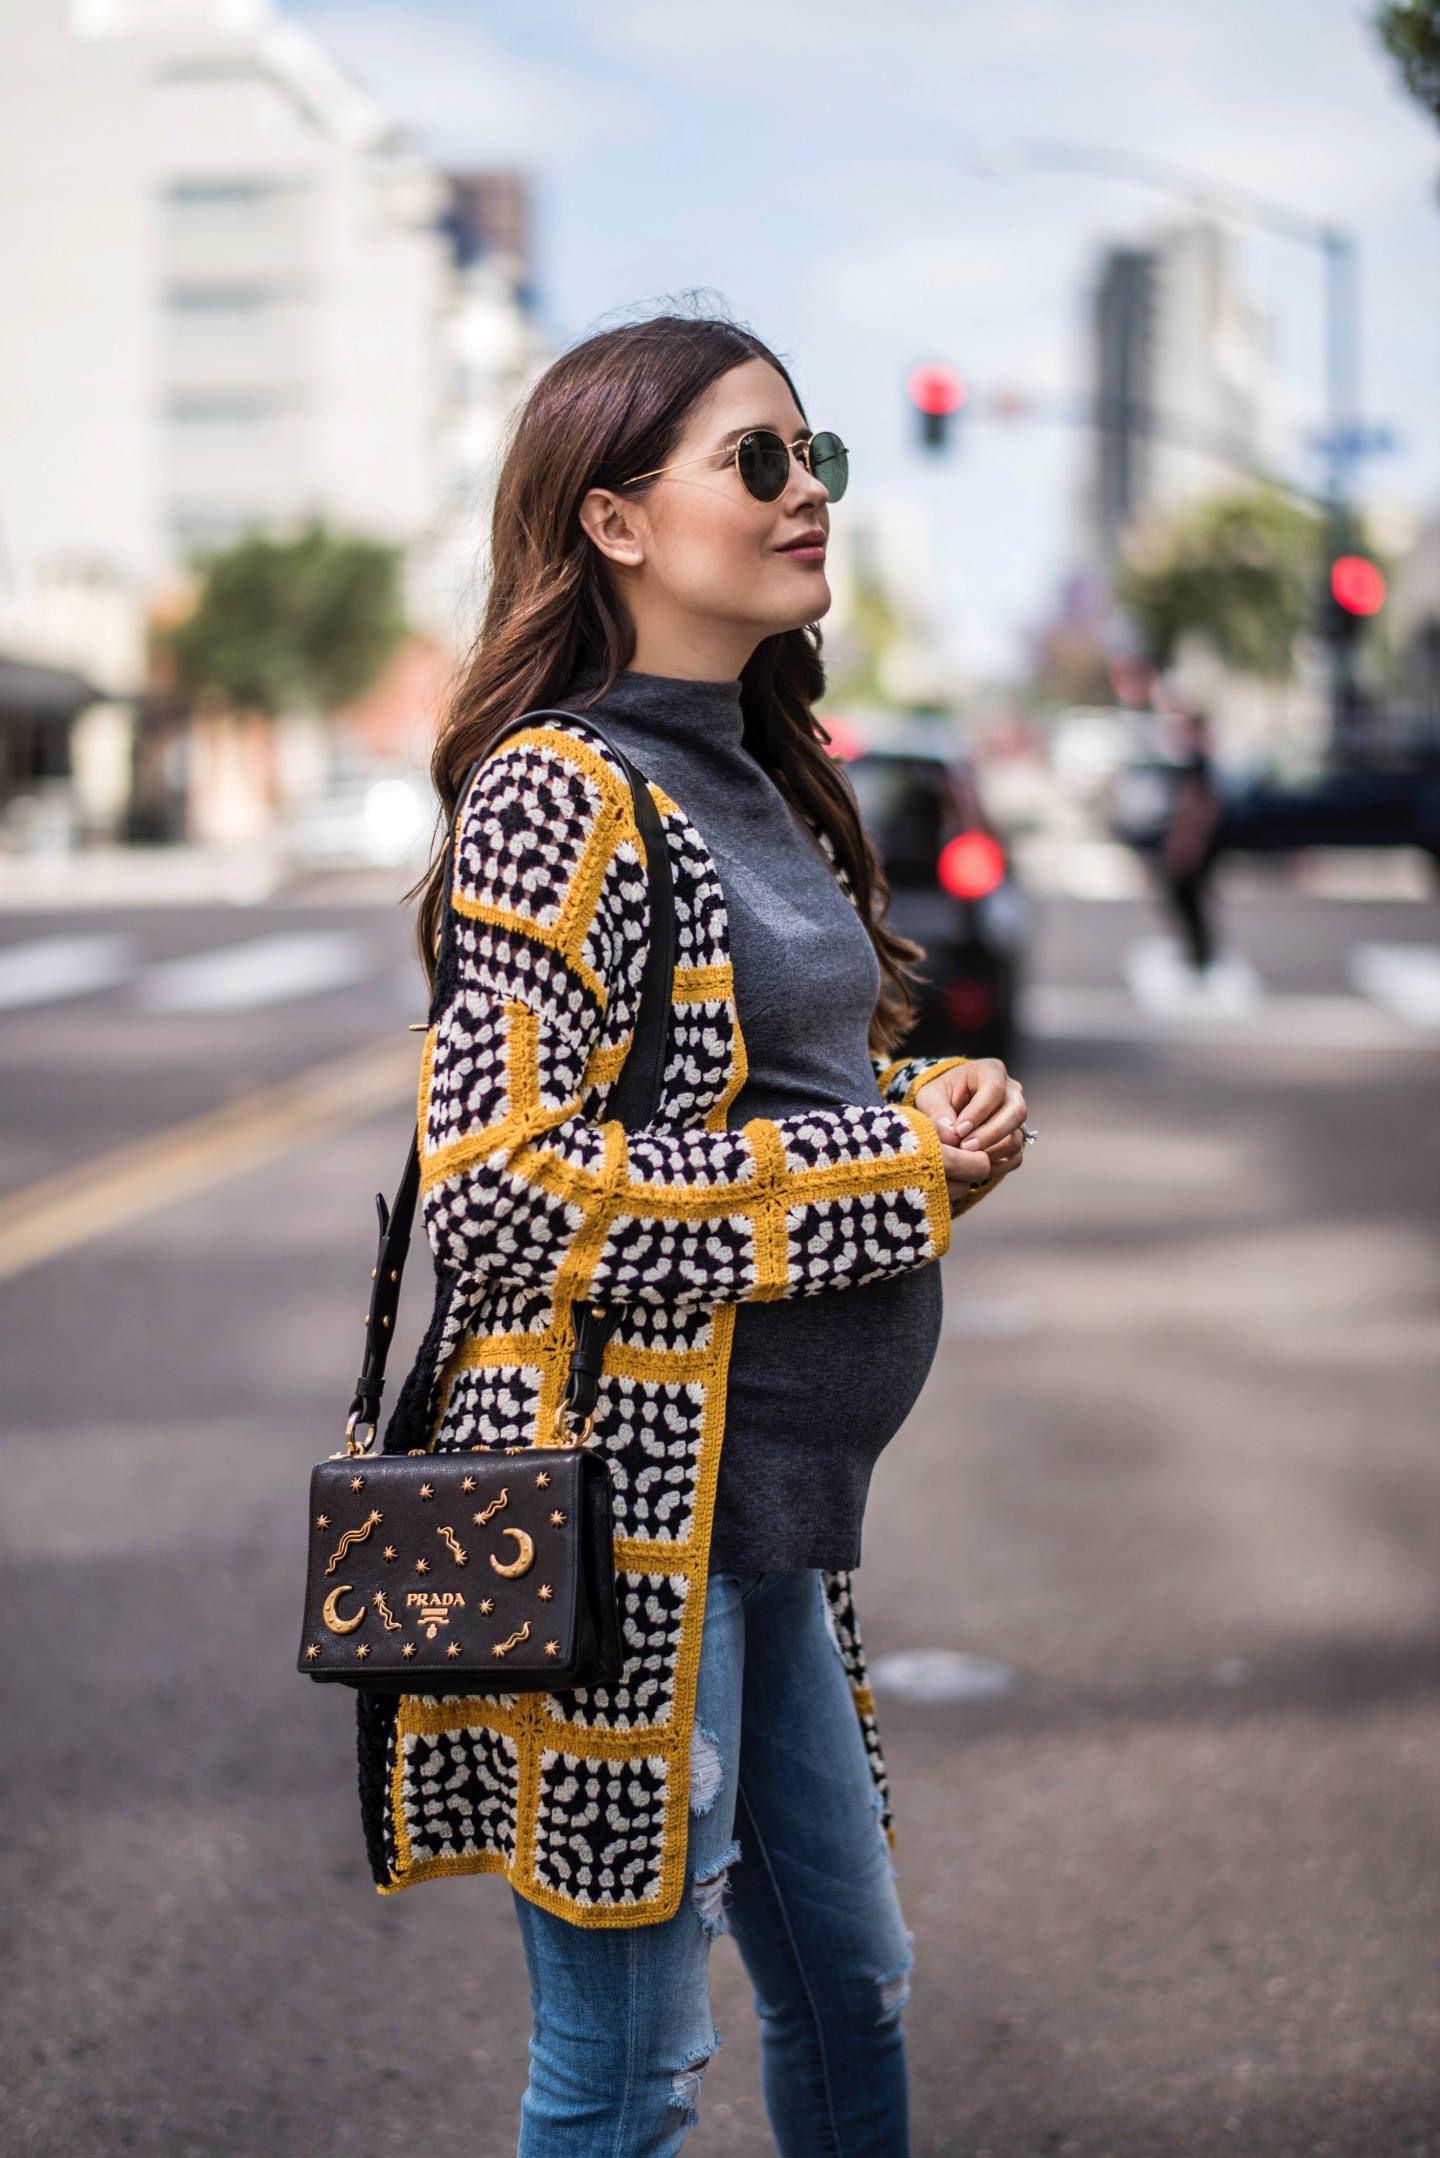 Zwangerschapskleding Zomerjas.Rocking The Maternity Jeans Aa Extra Modellen Crochet